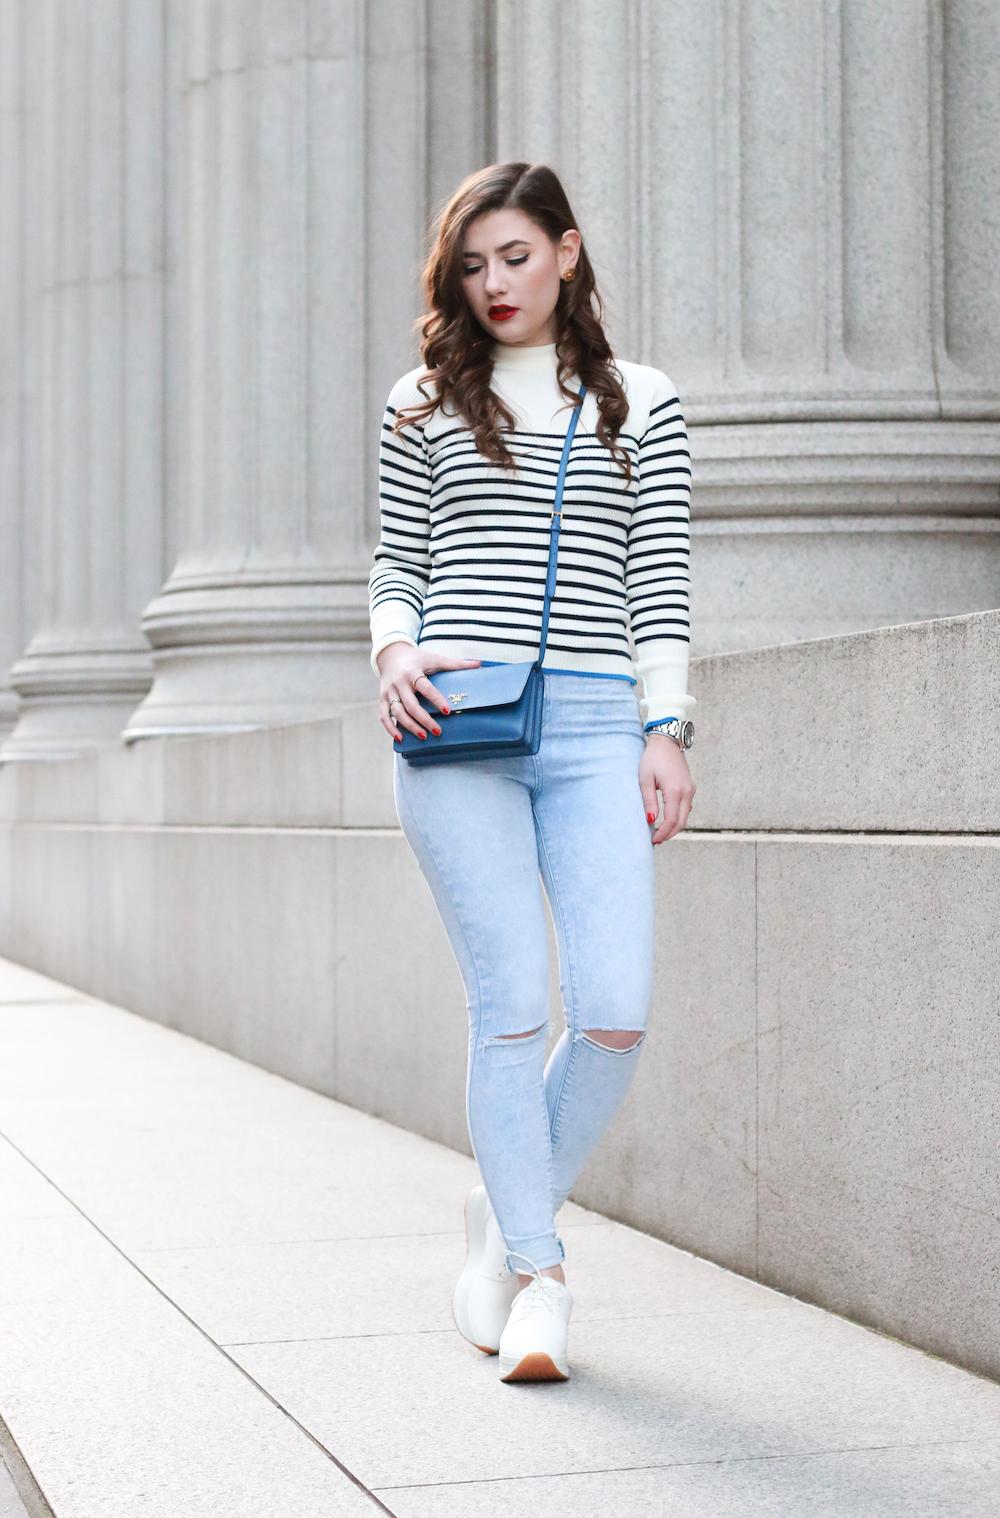 sara-bow-blogger-outfit-vagabond-schuhe